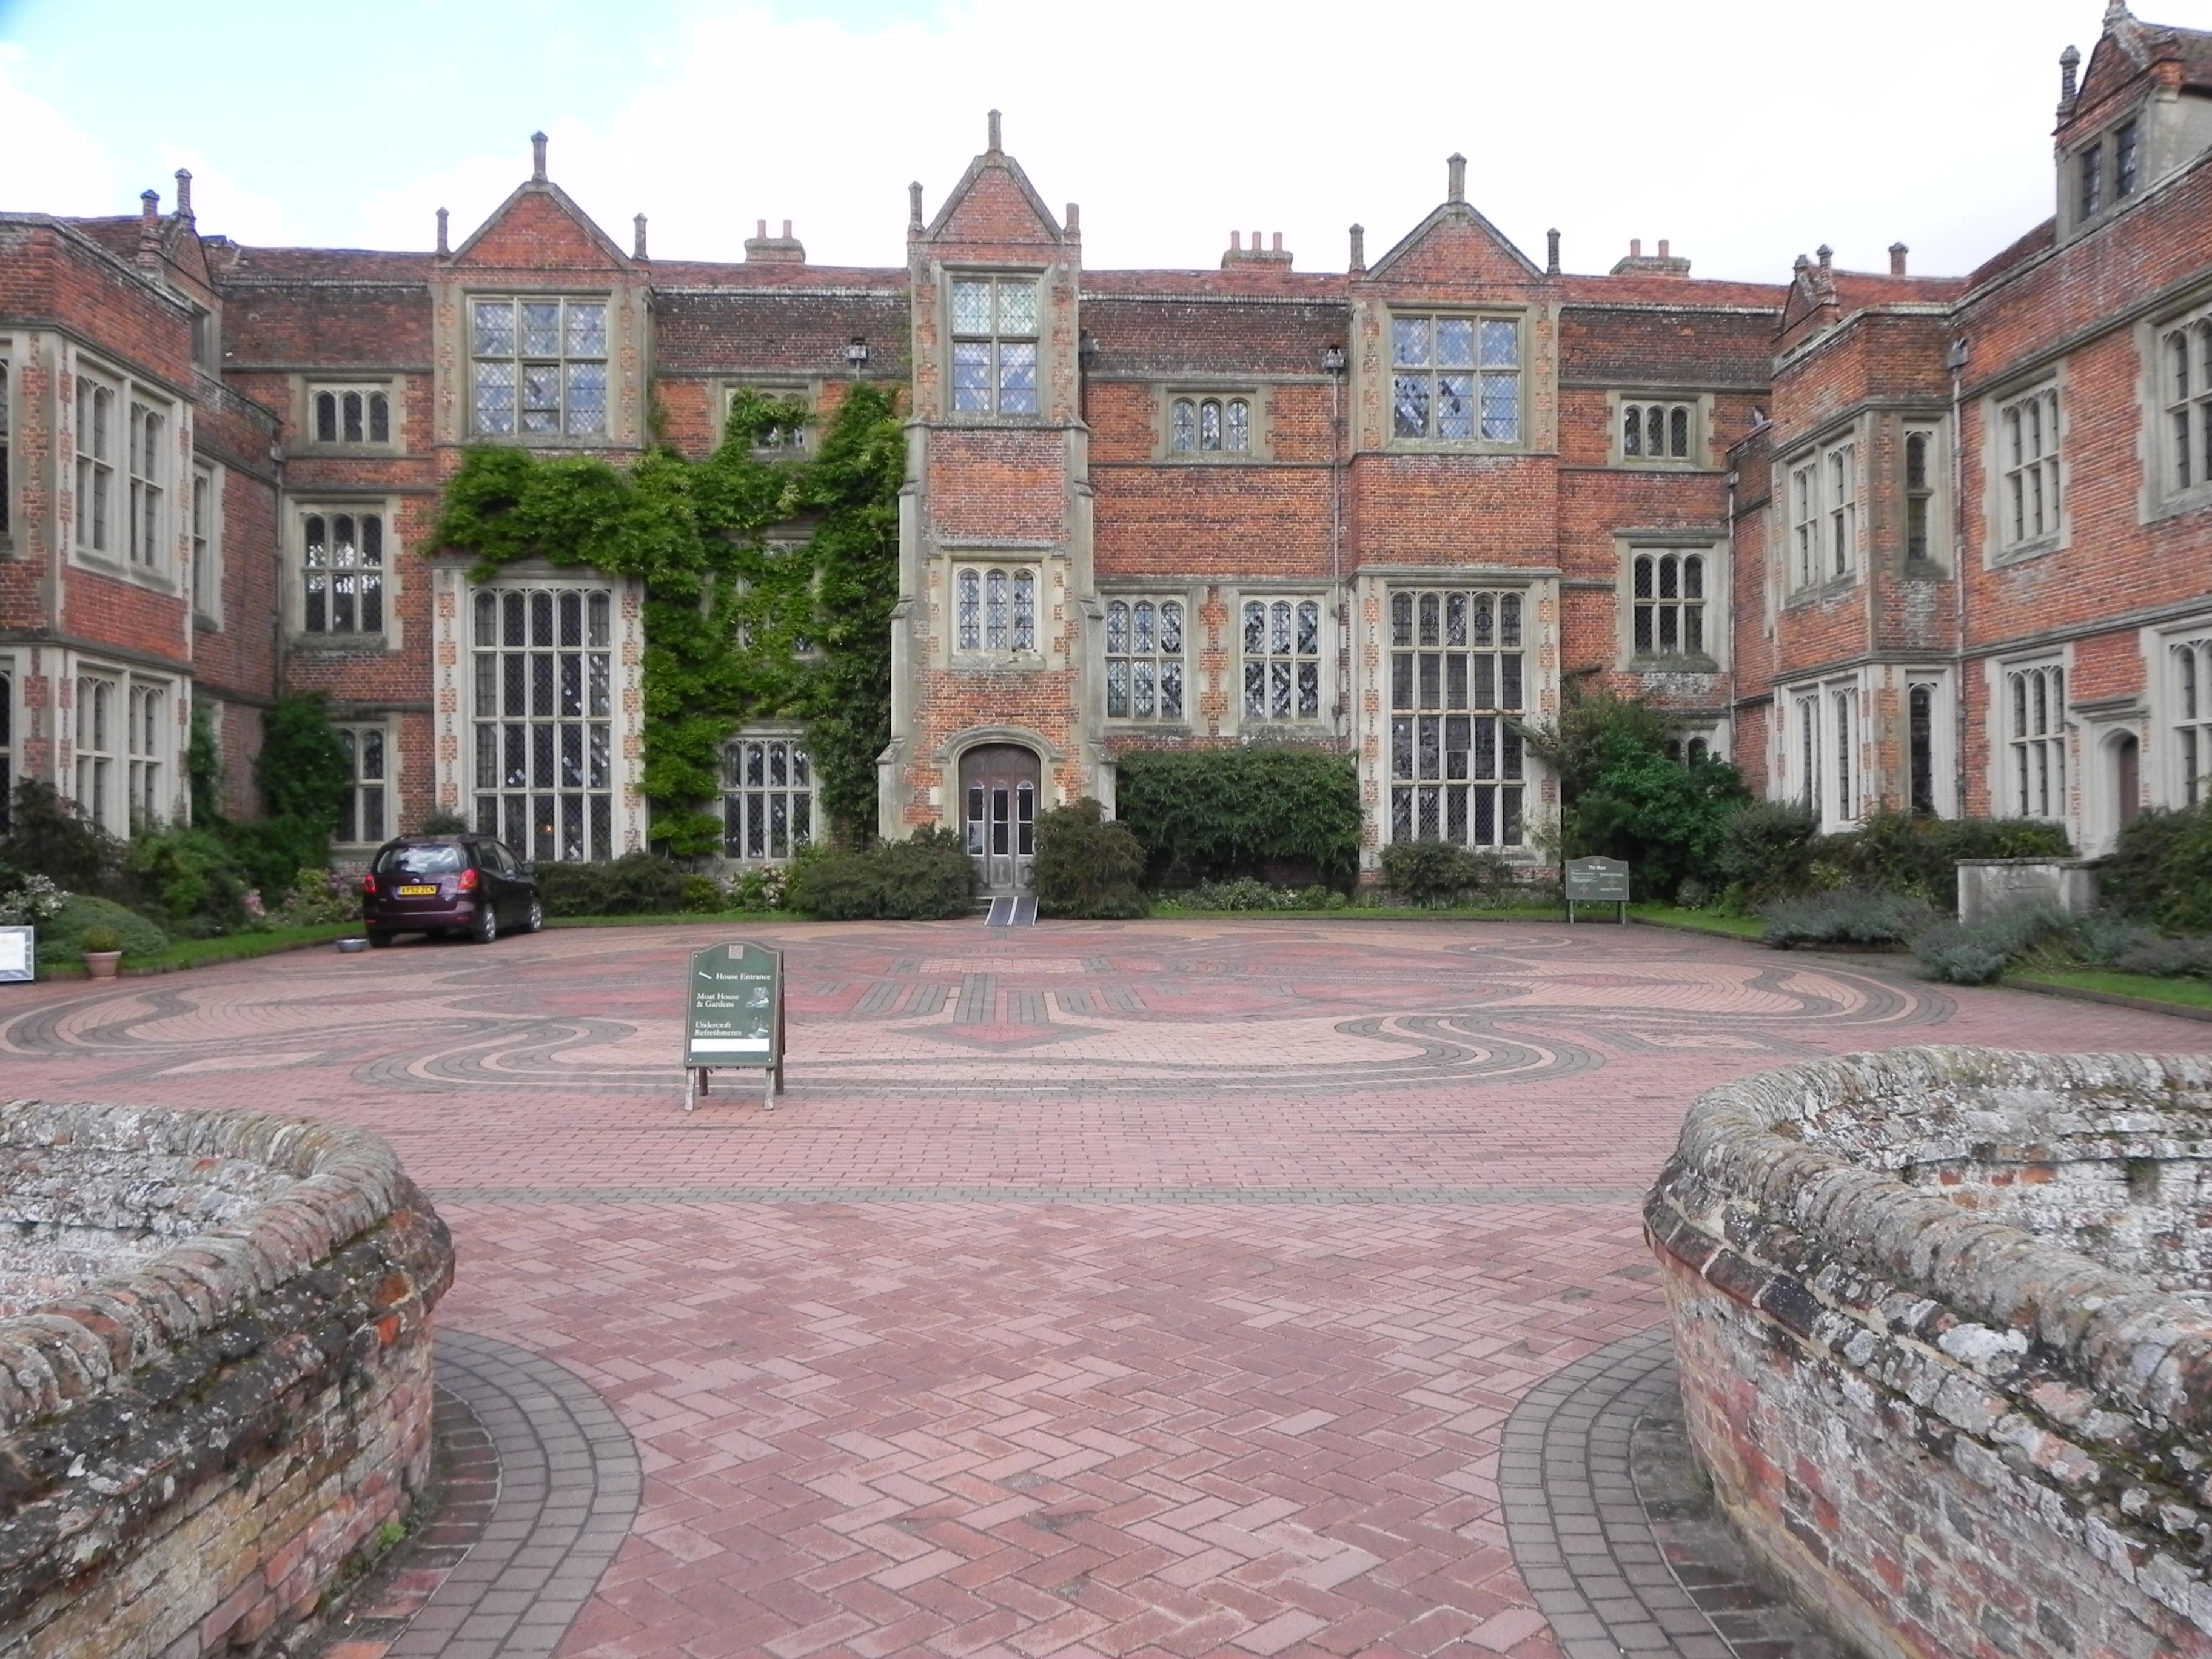 Tudor hall photo